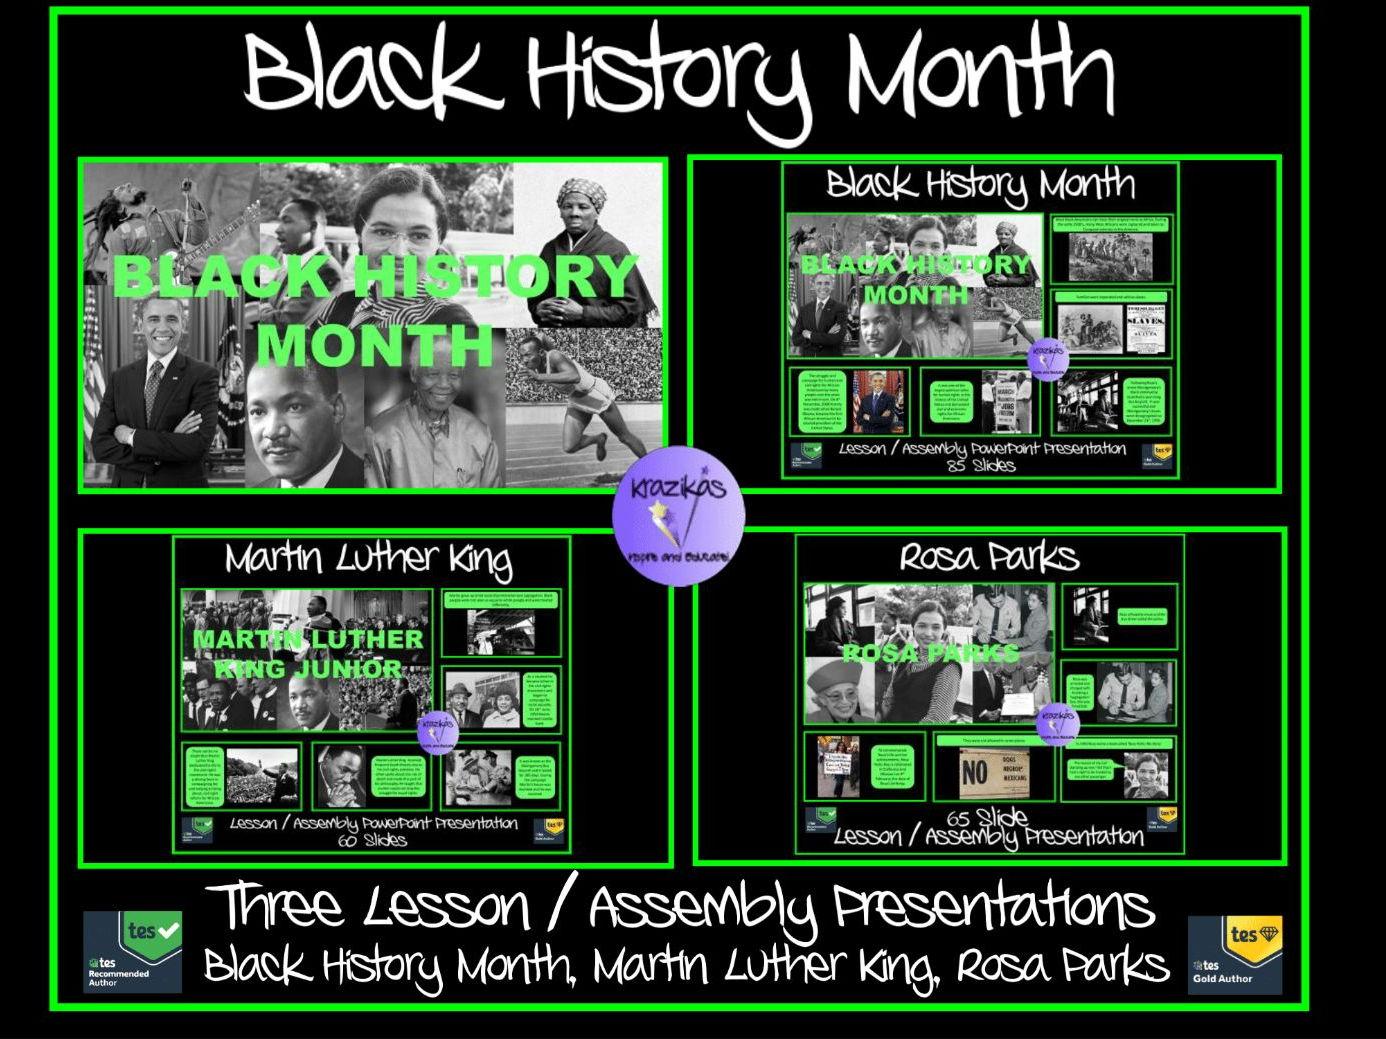 black history black history month presentation 85 slides by